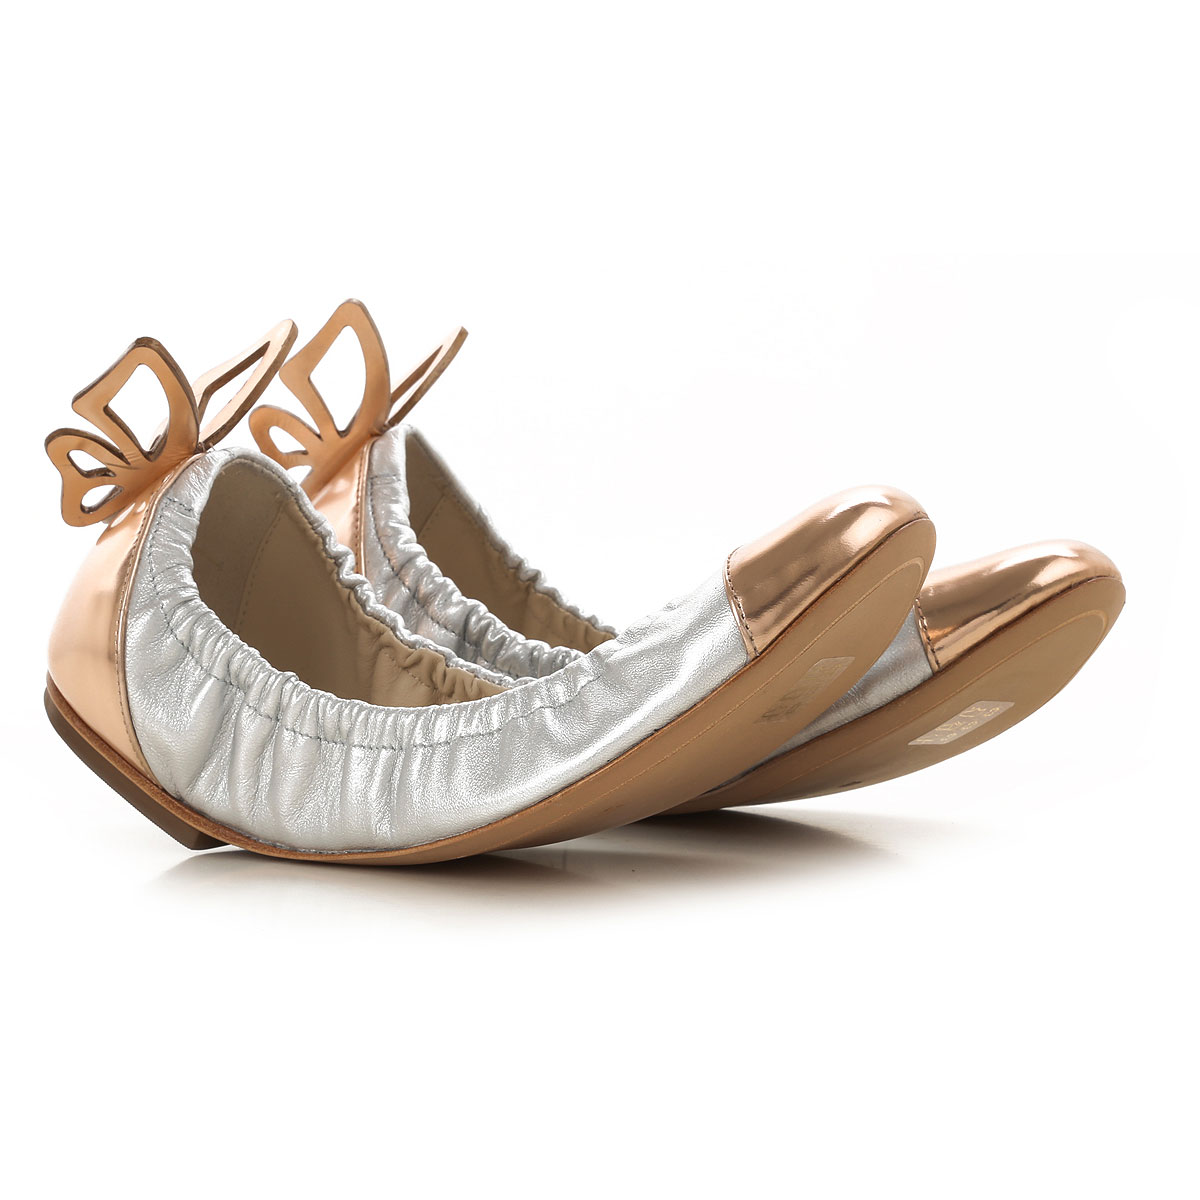 Image of Sophia Webster Ballet Flats Ballerina Shoes for Women, Silver, Leather, 2017, 5 6 7 8